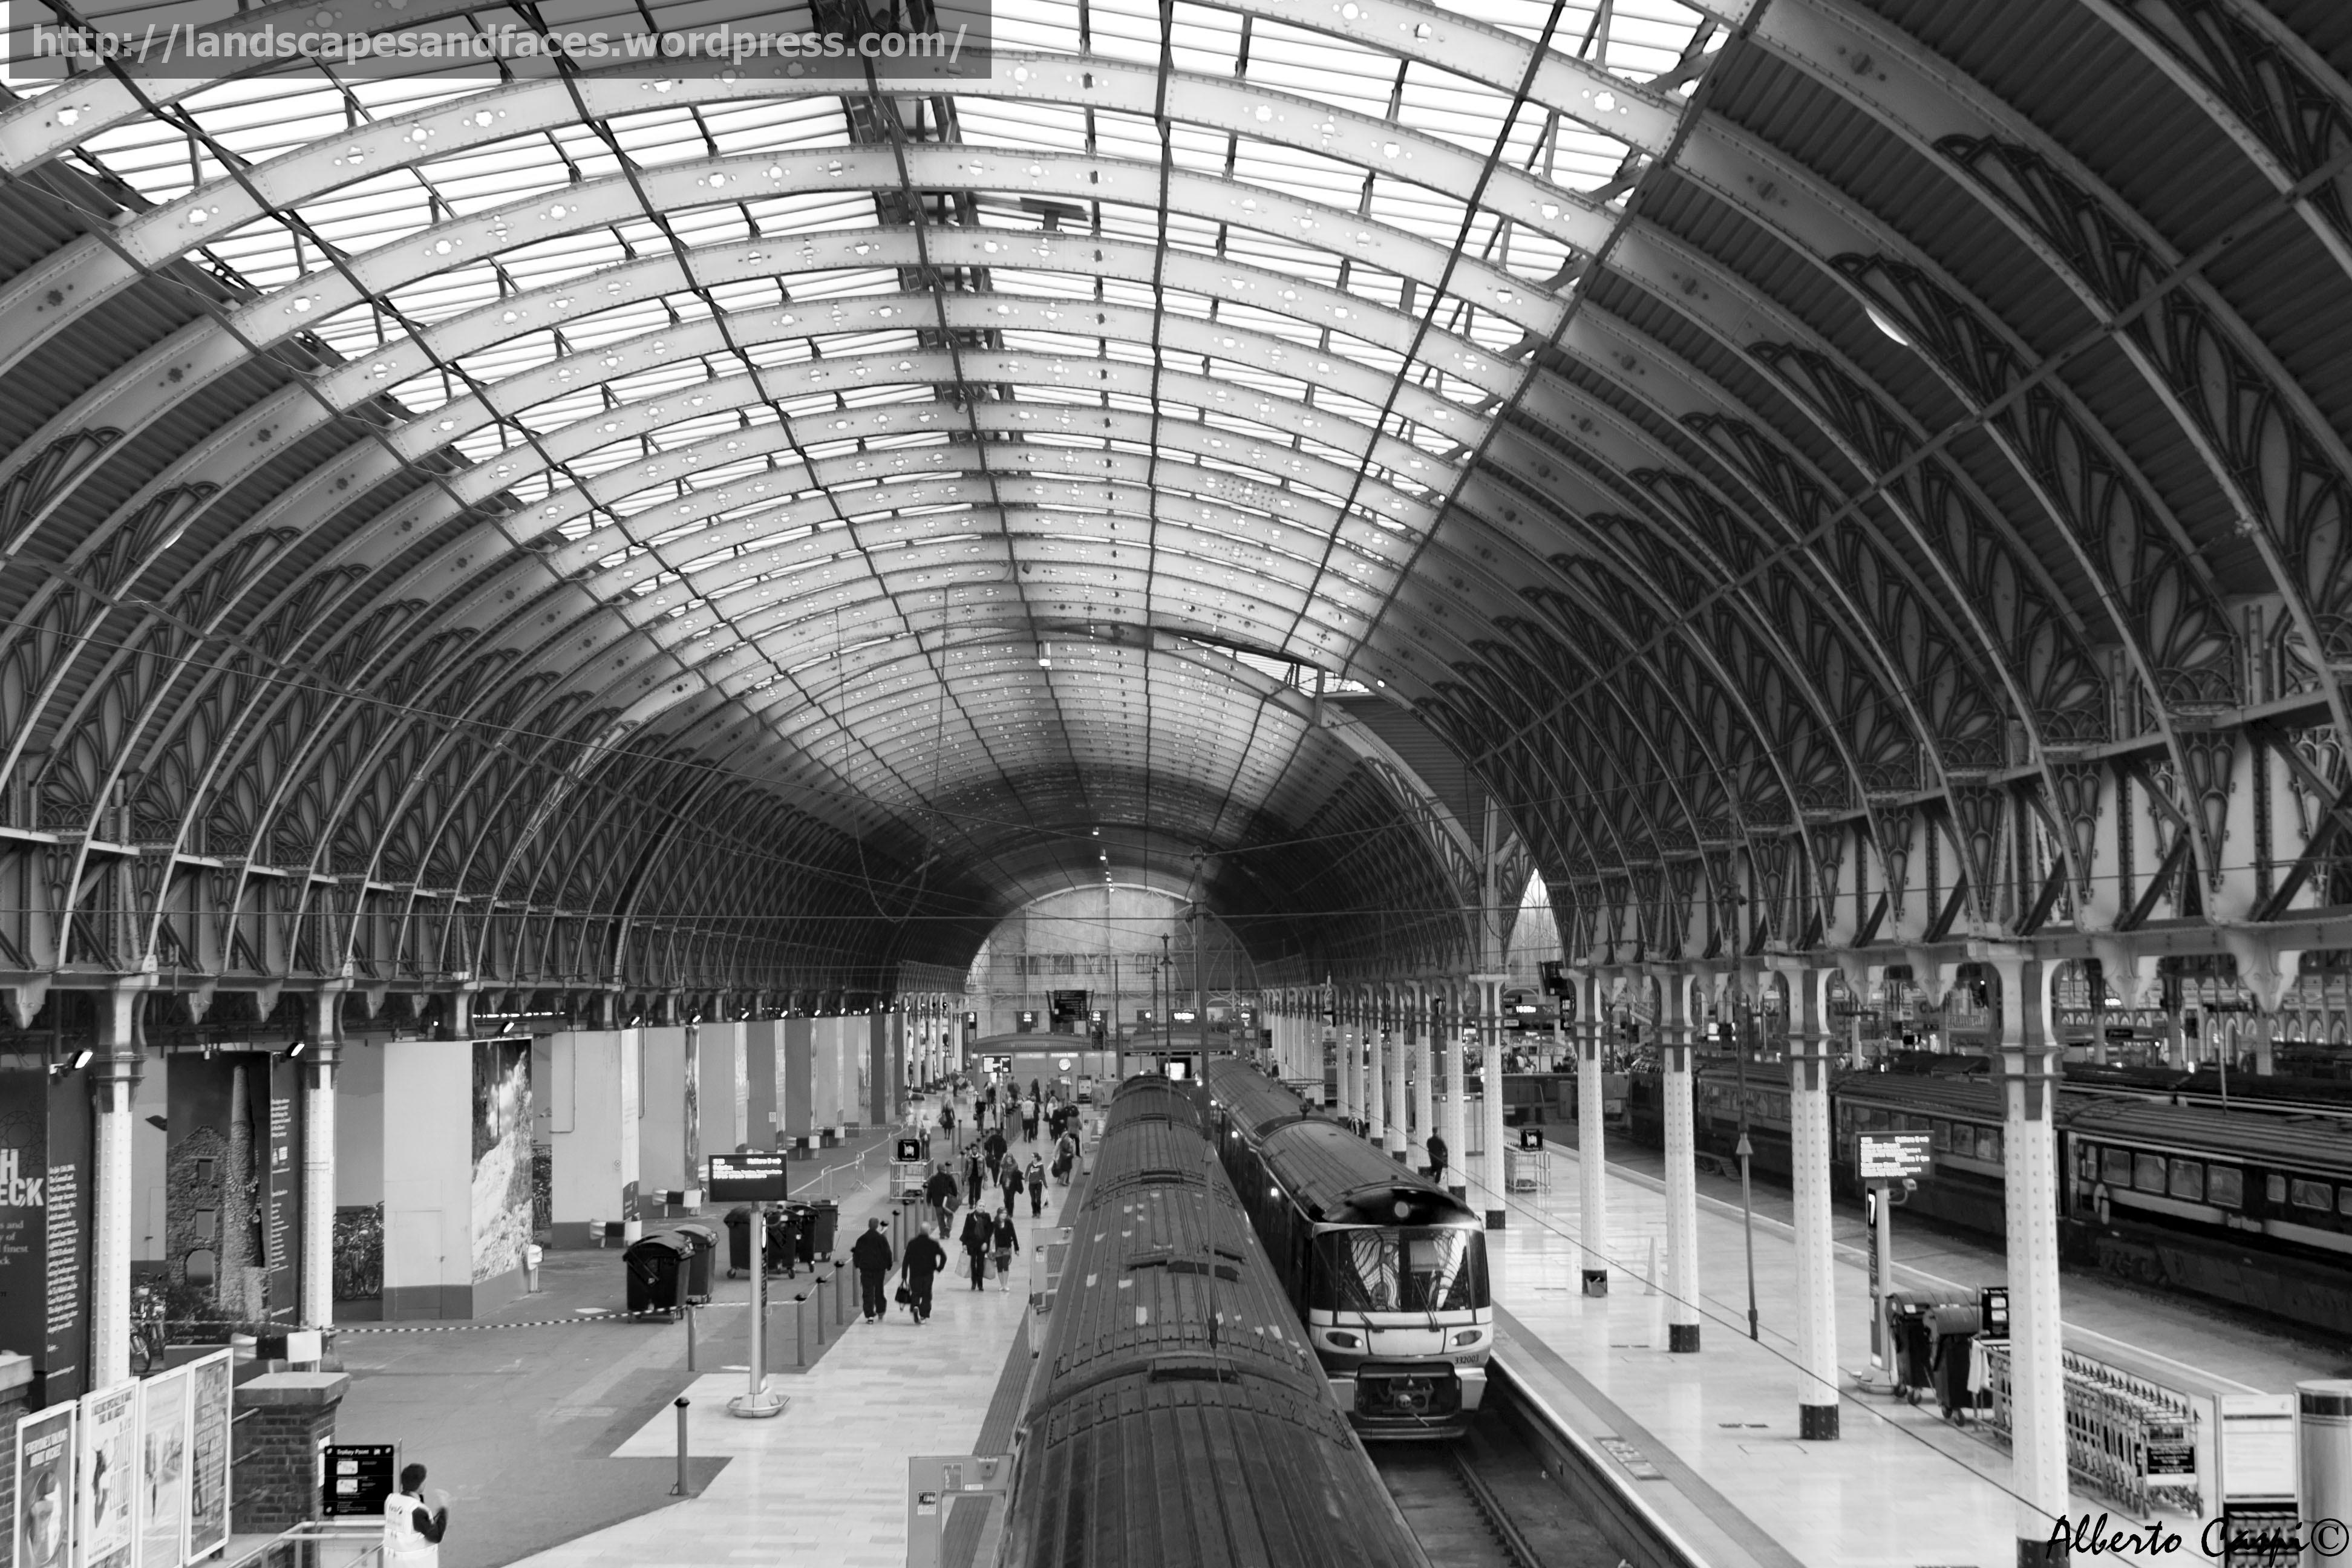 Paddington - London